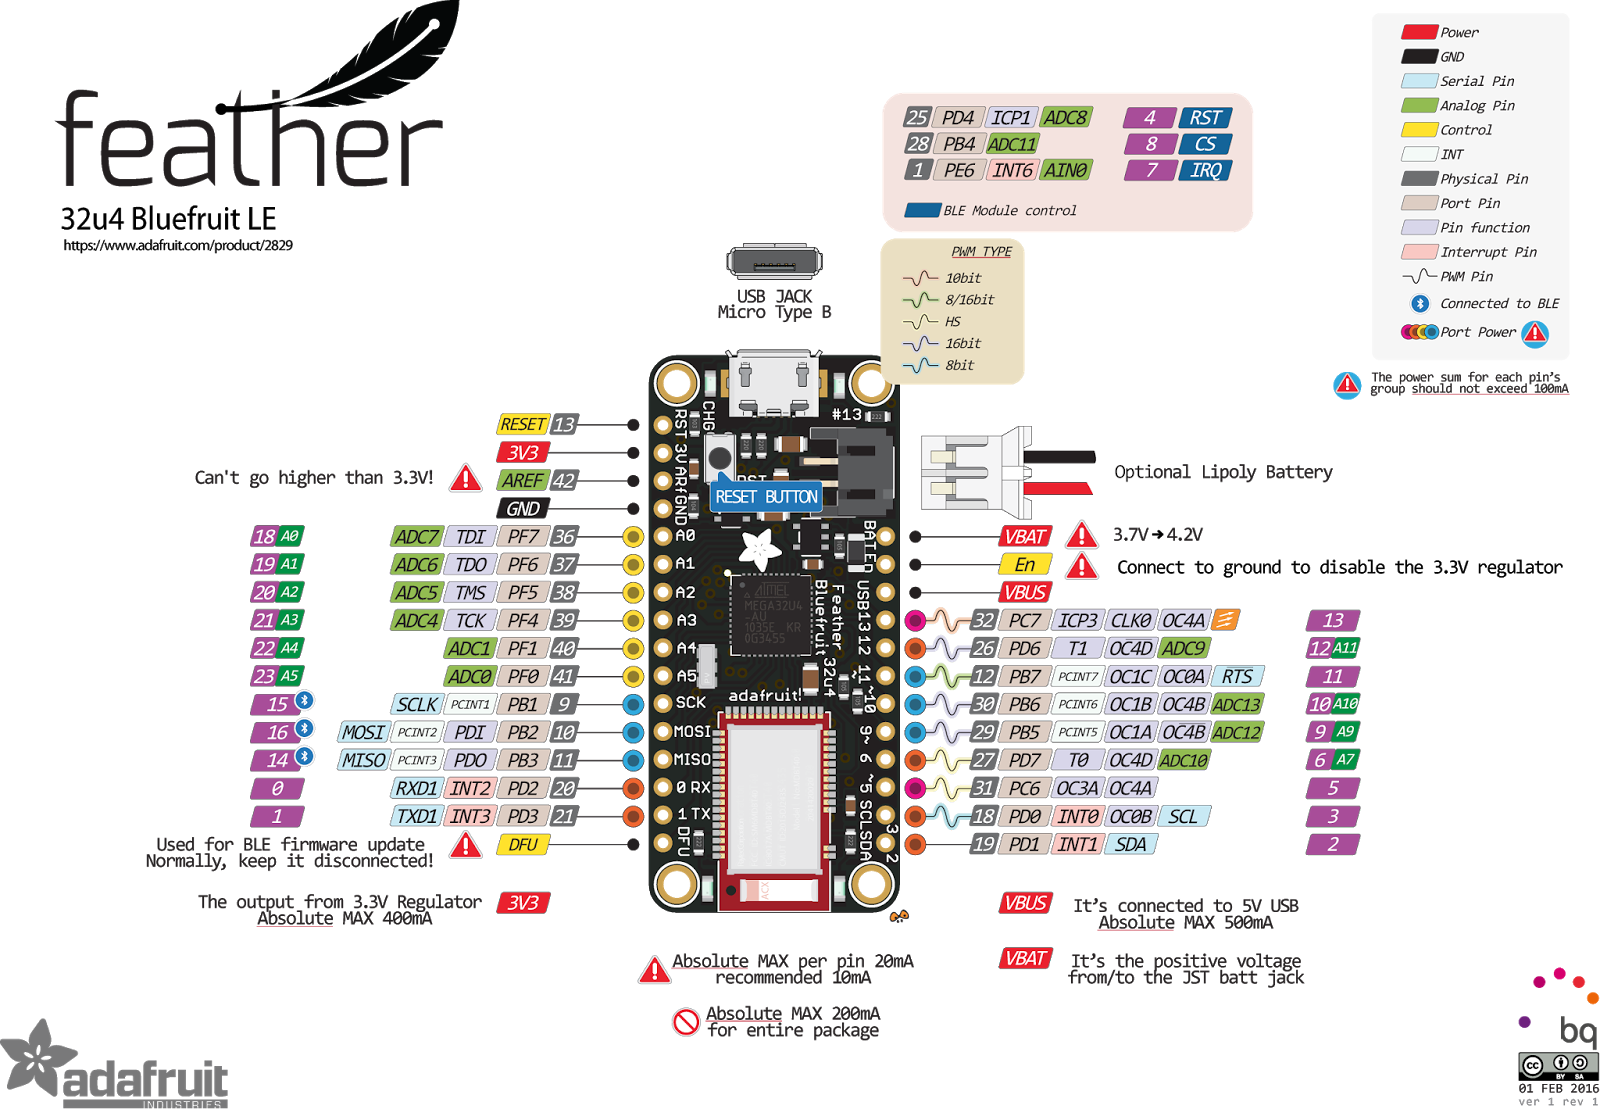 Hardware Adafruit Feather 32u4 Radio (RFM69HCW) Software